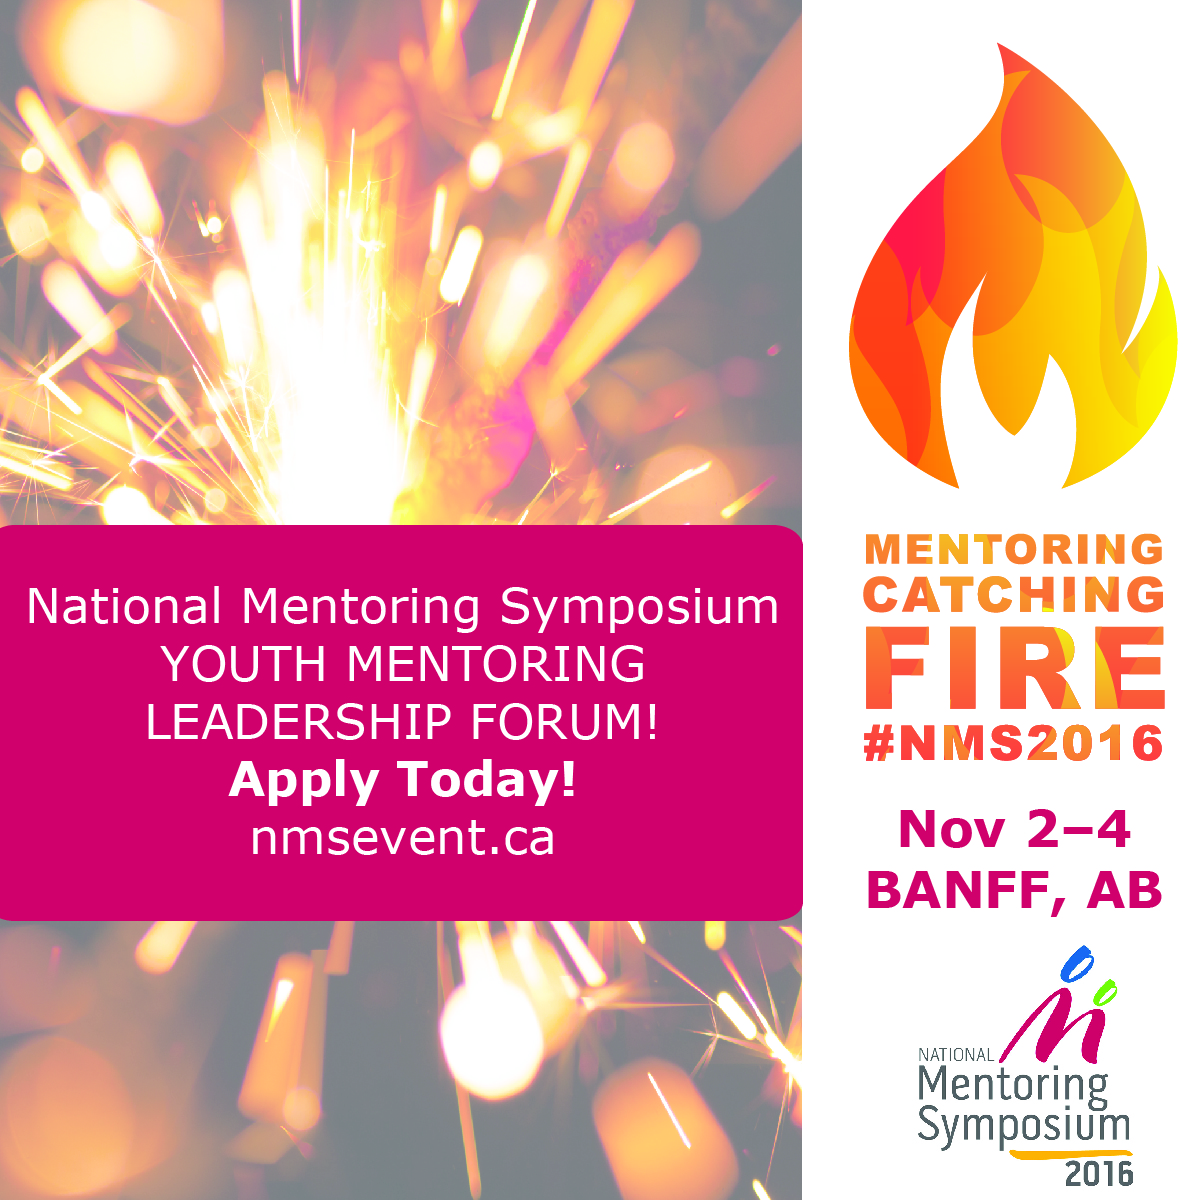 Youth Leadership Forum National Mentoring Symposium 2016